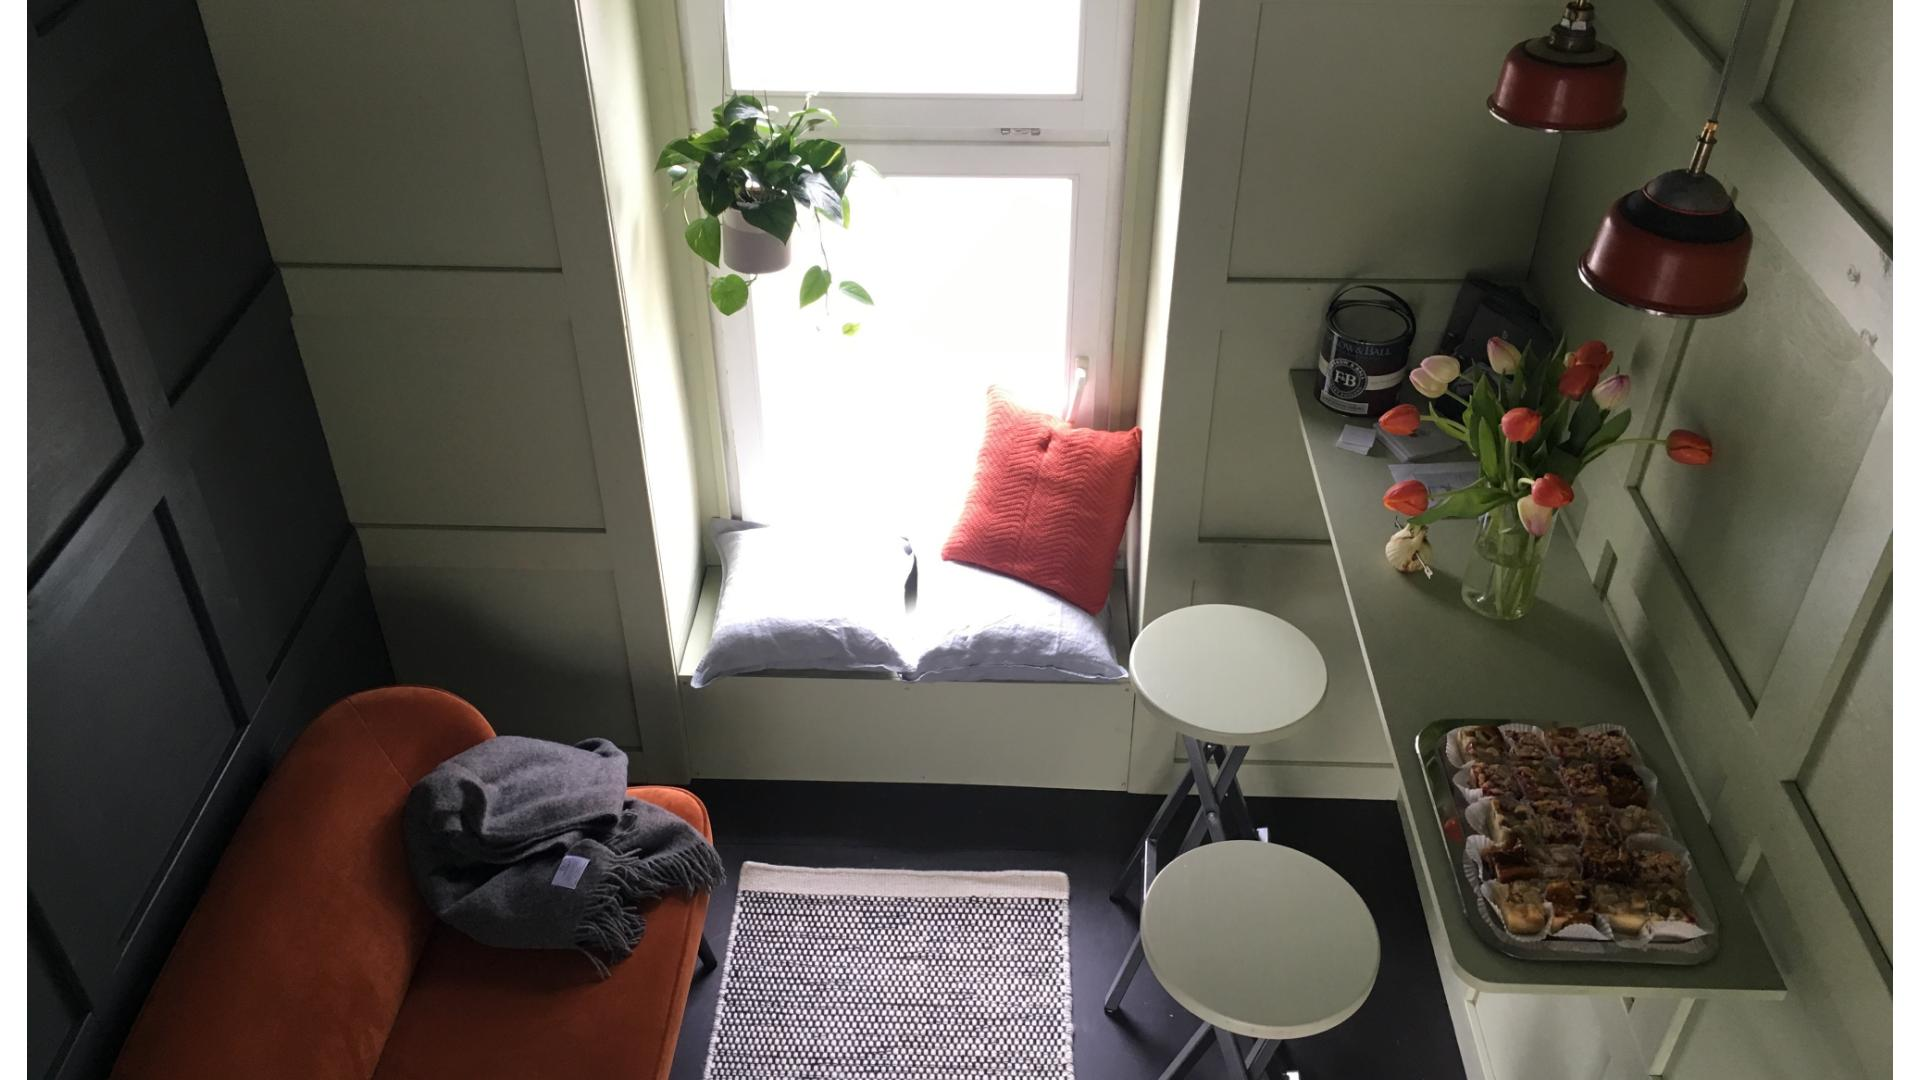 Linara Neues Wohnkonzept